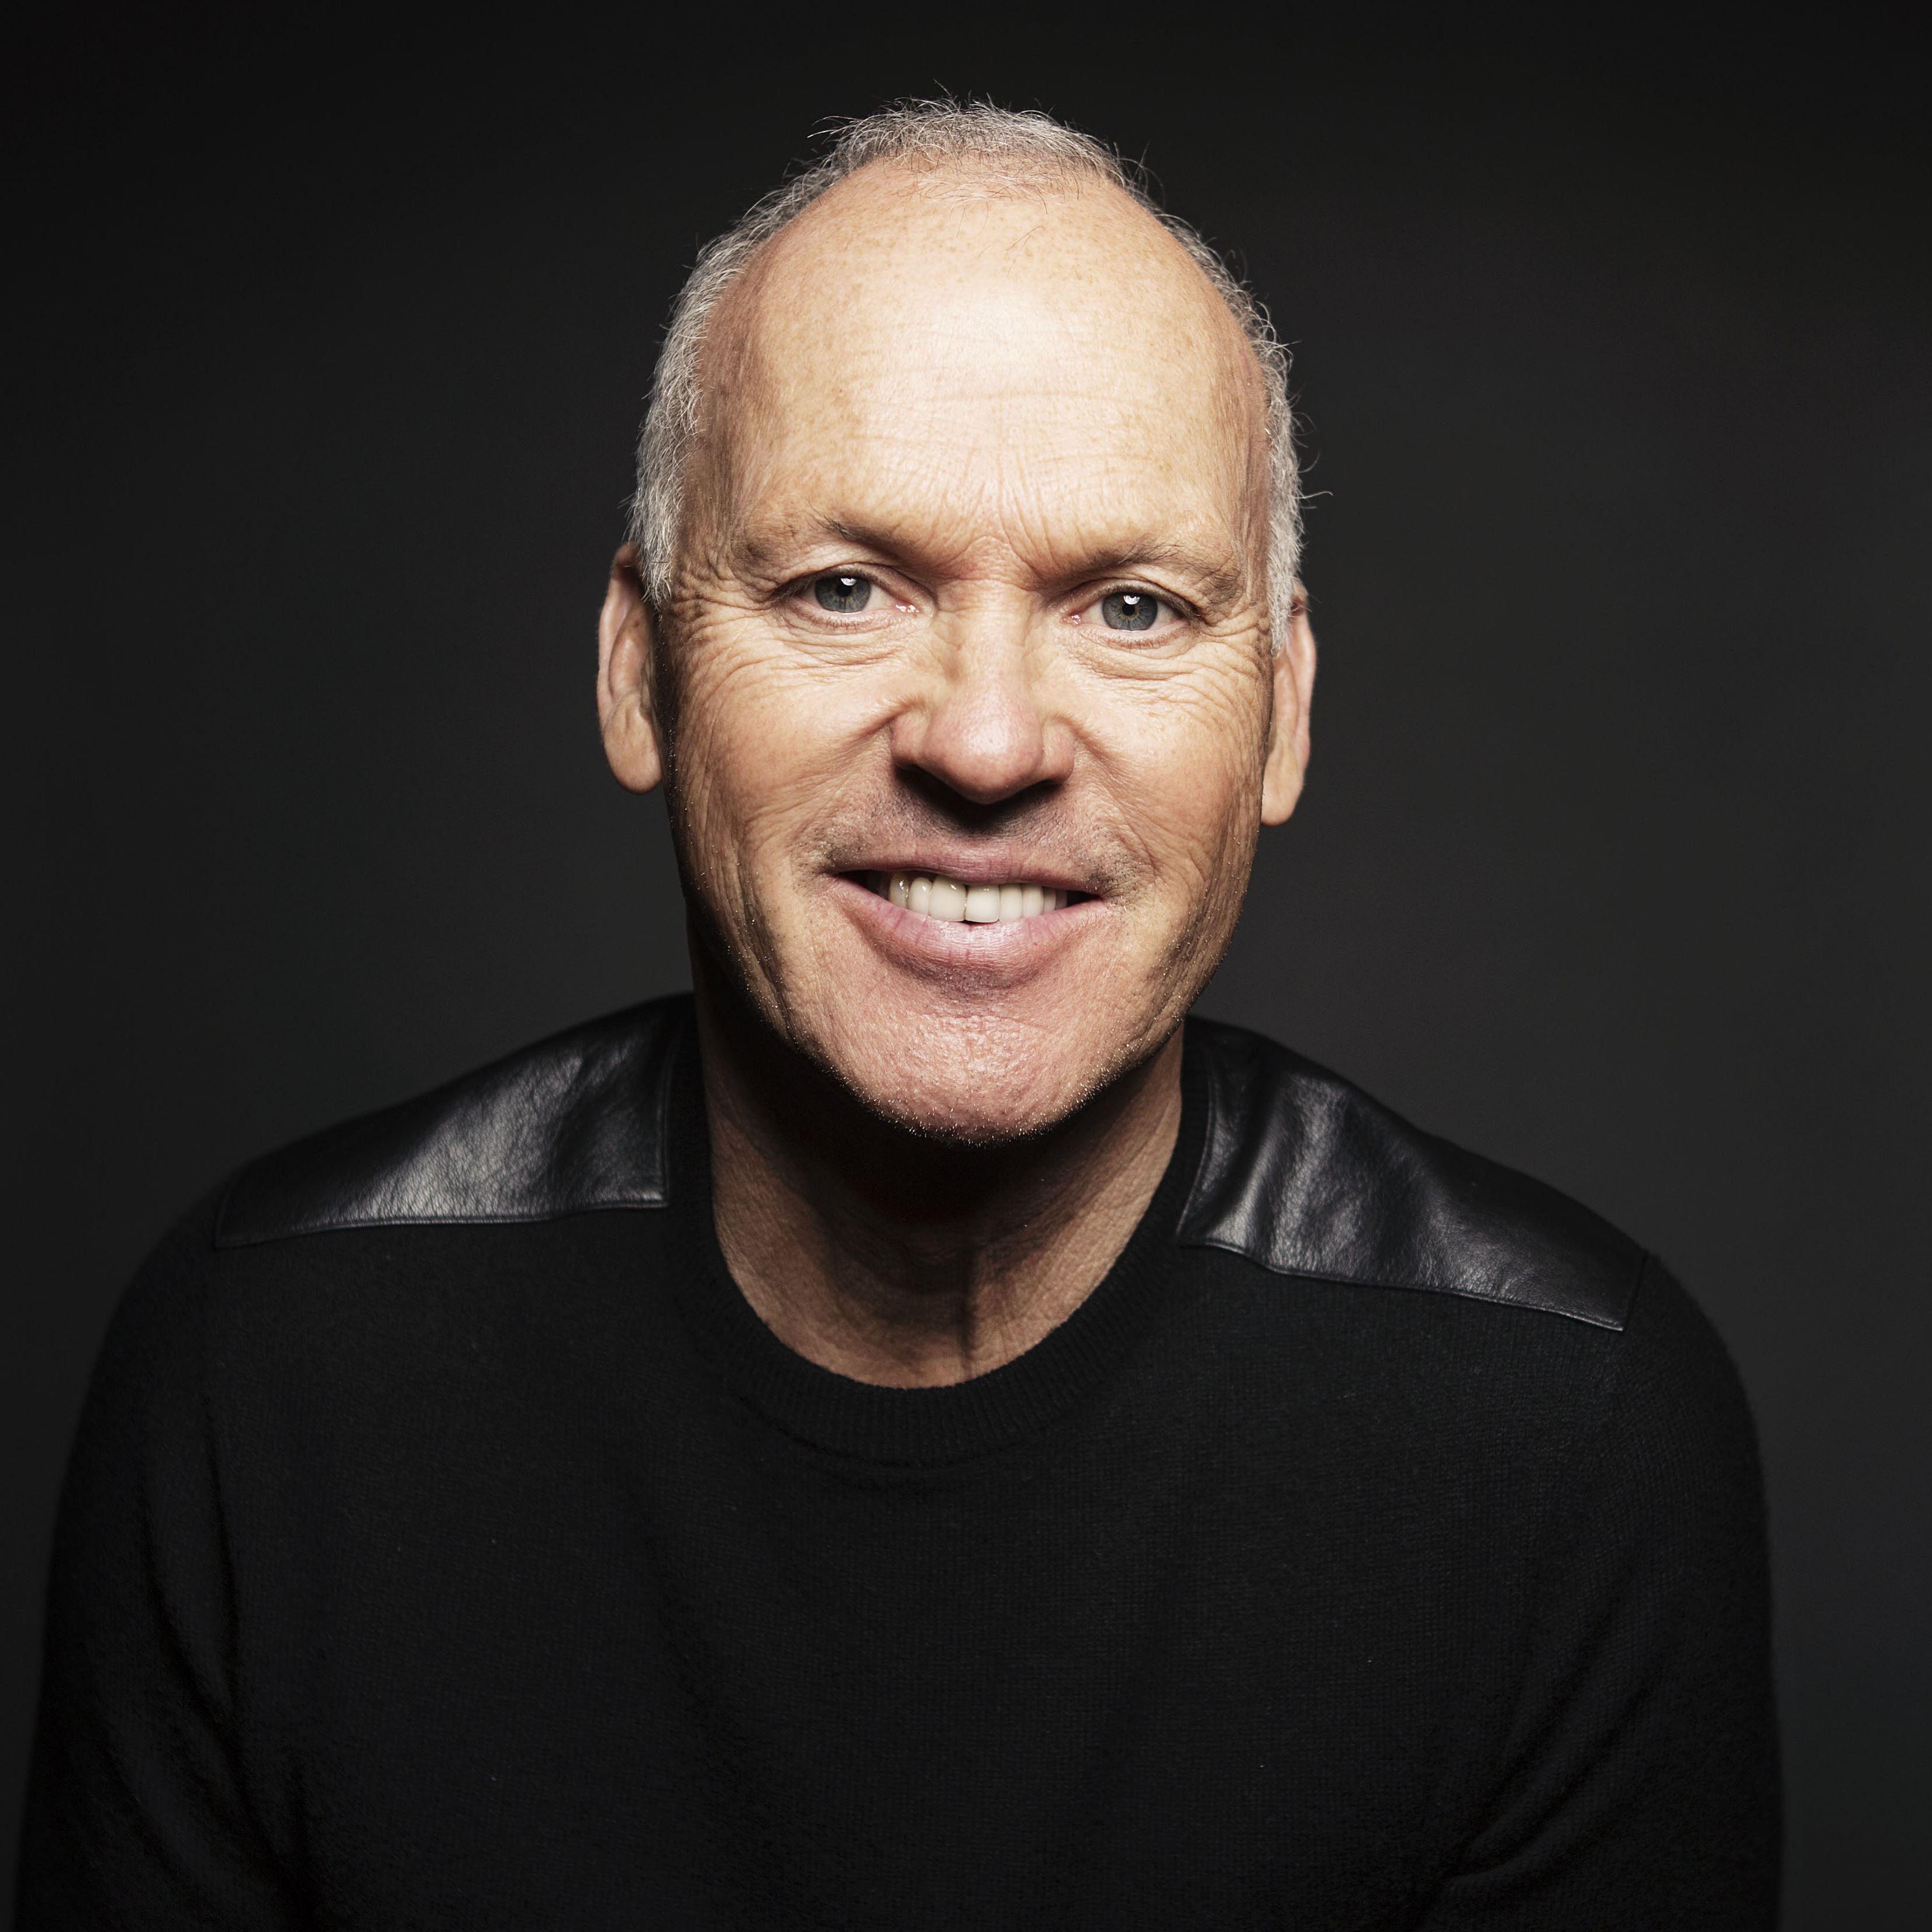 Michael Keaton HQ wallpapers